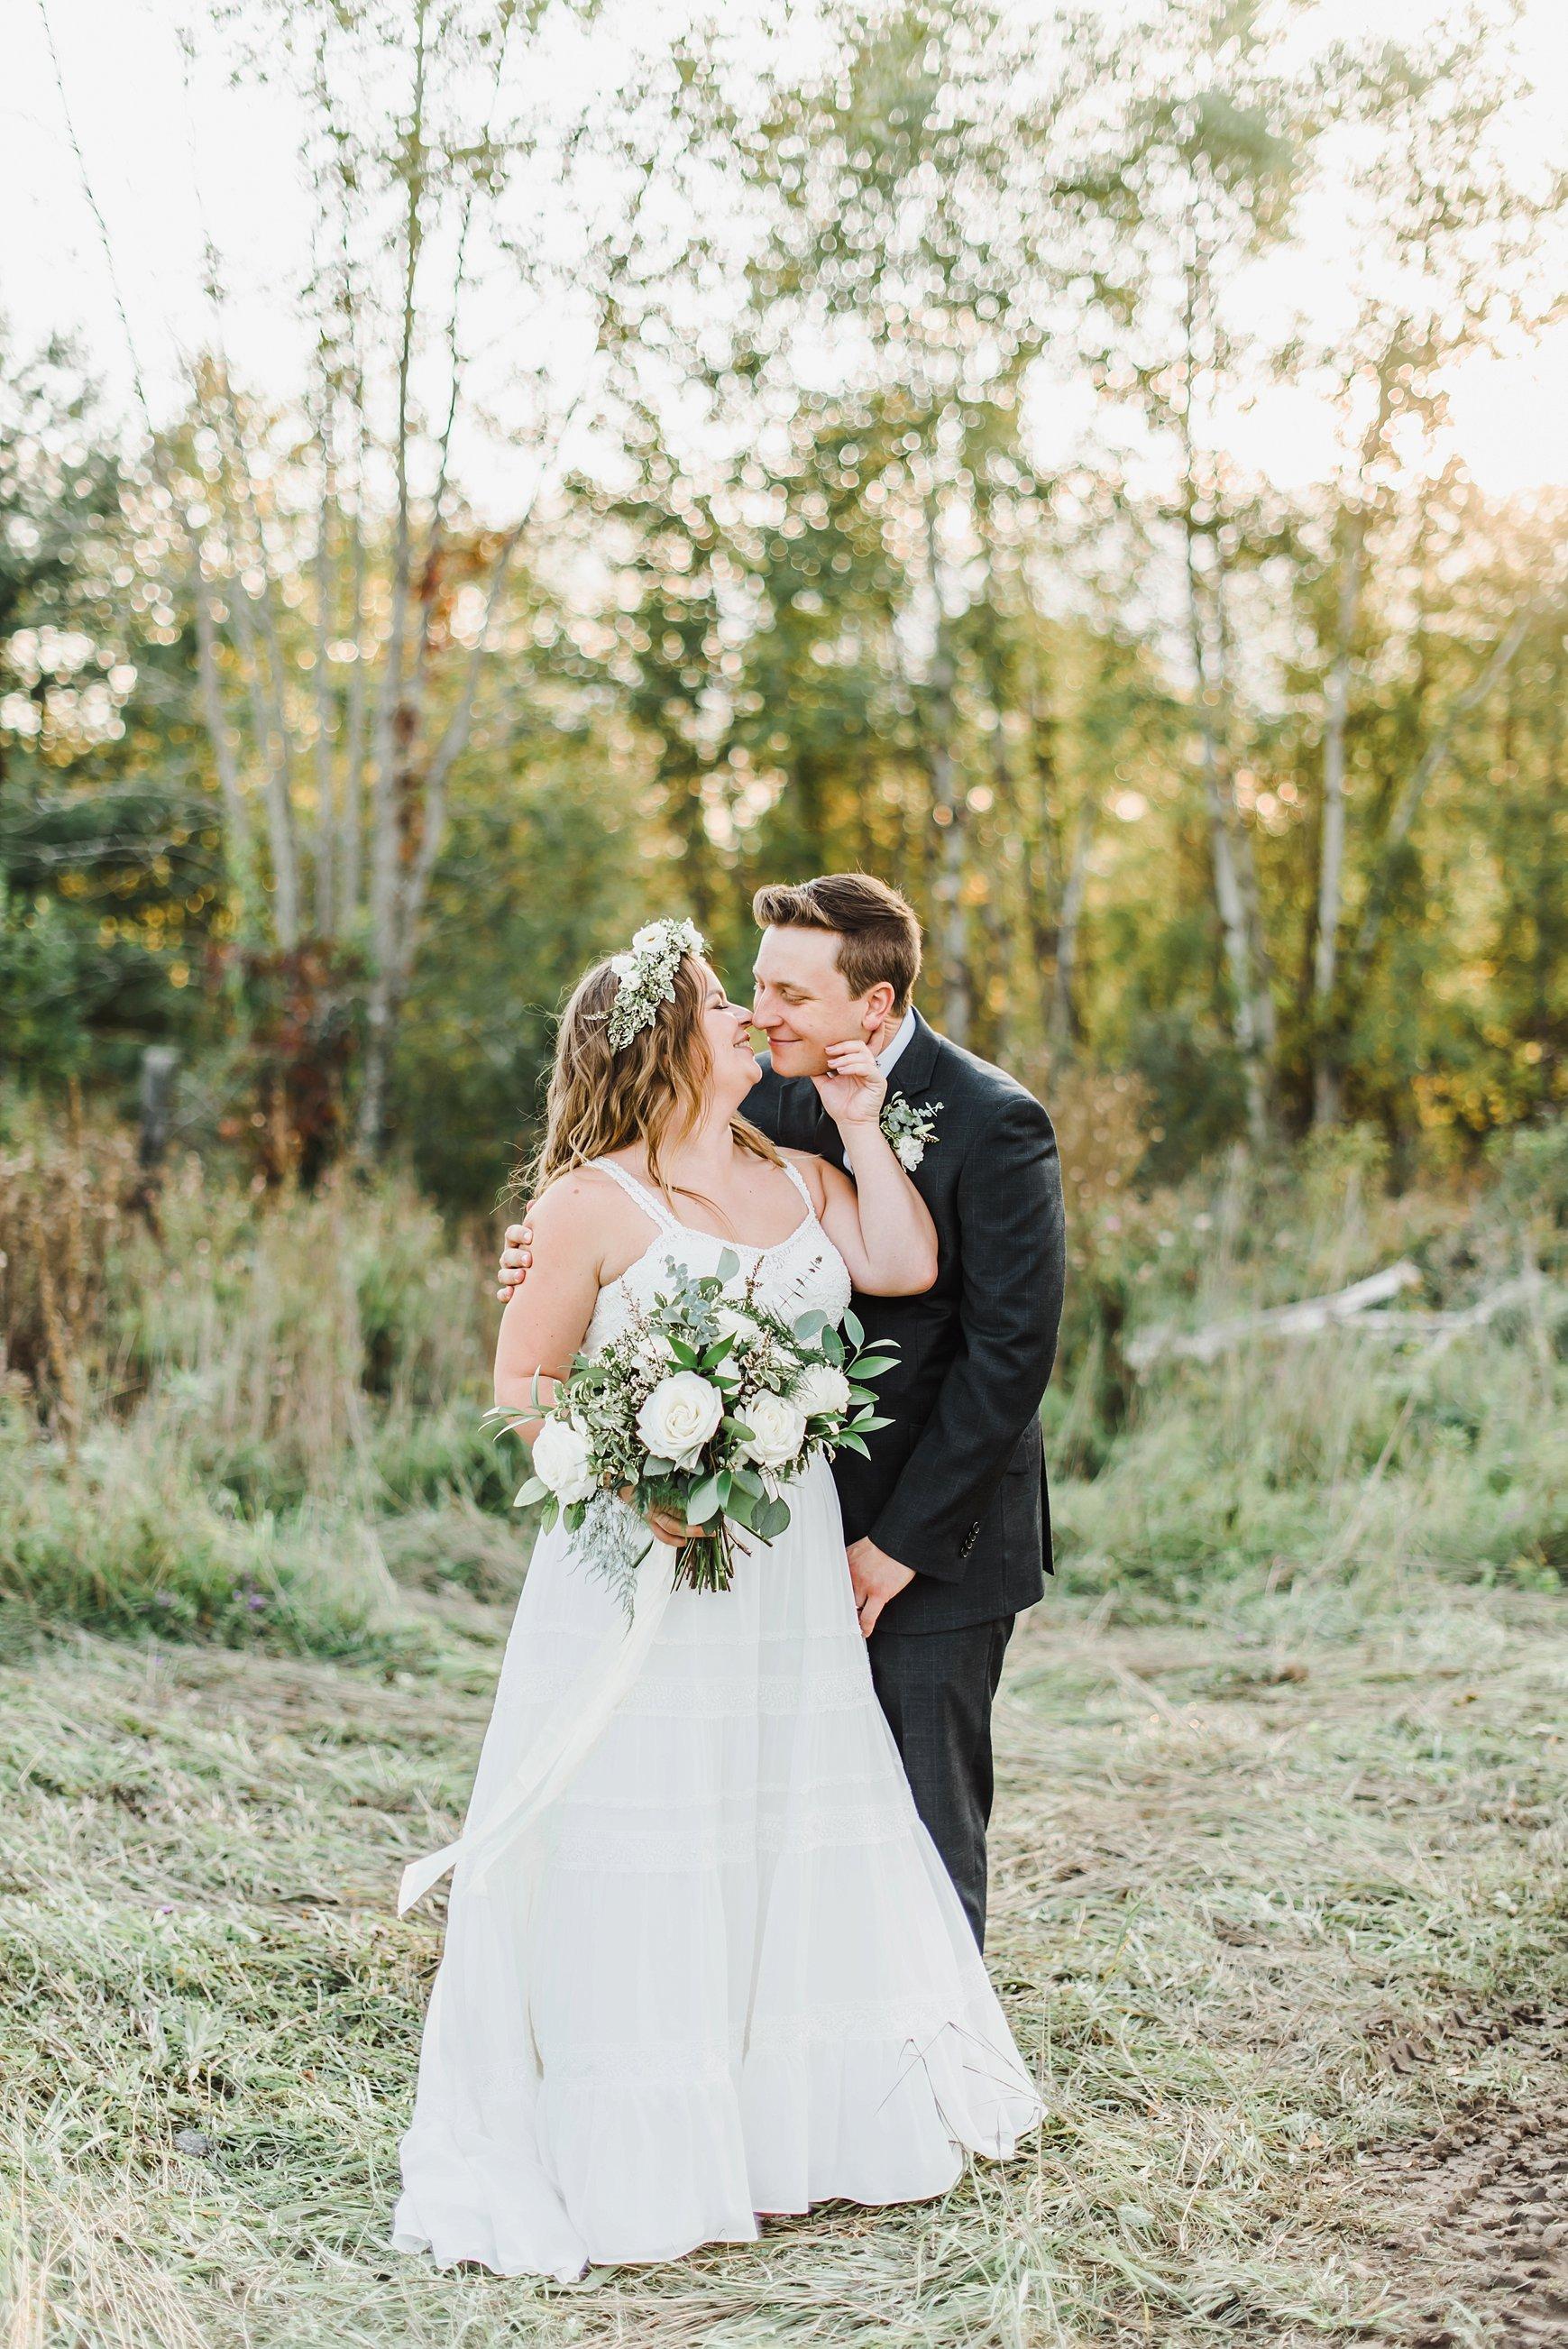 light airy indie fine art ottawa wedding photographer | Ali and Batoul Photography_1204.jpg